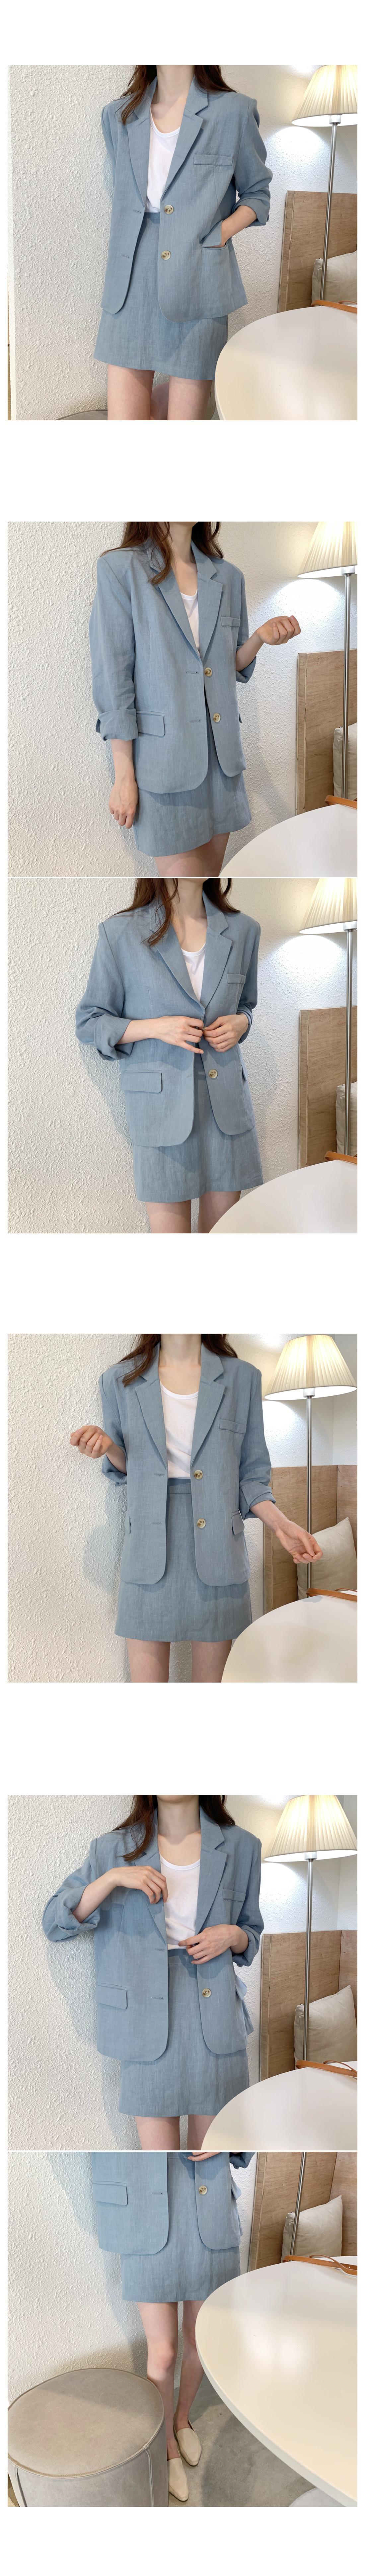 Bishop Linen Single Jacket